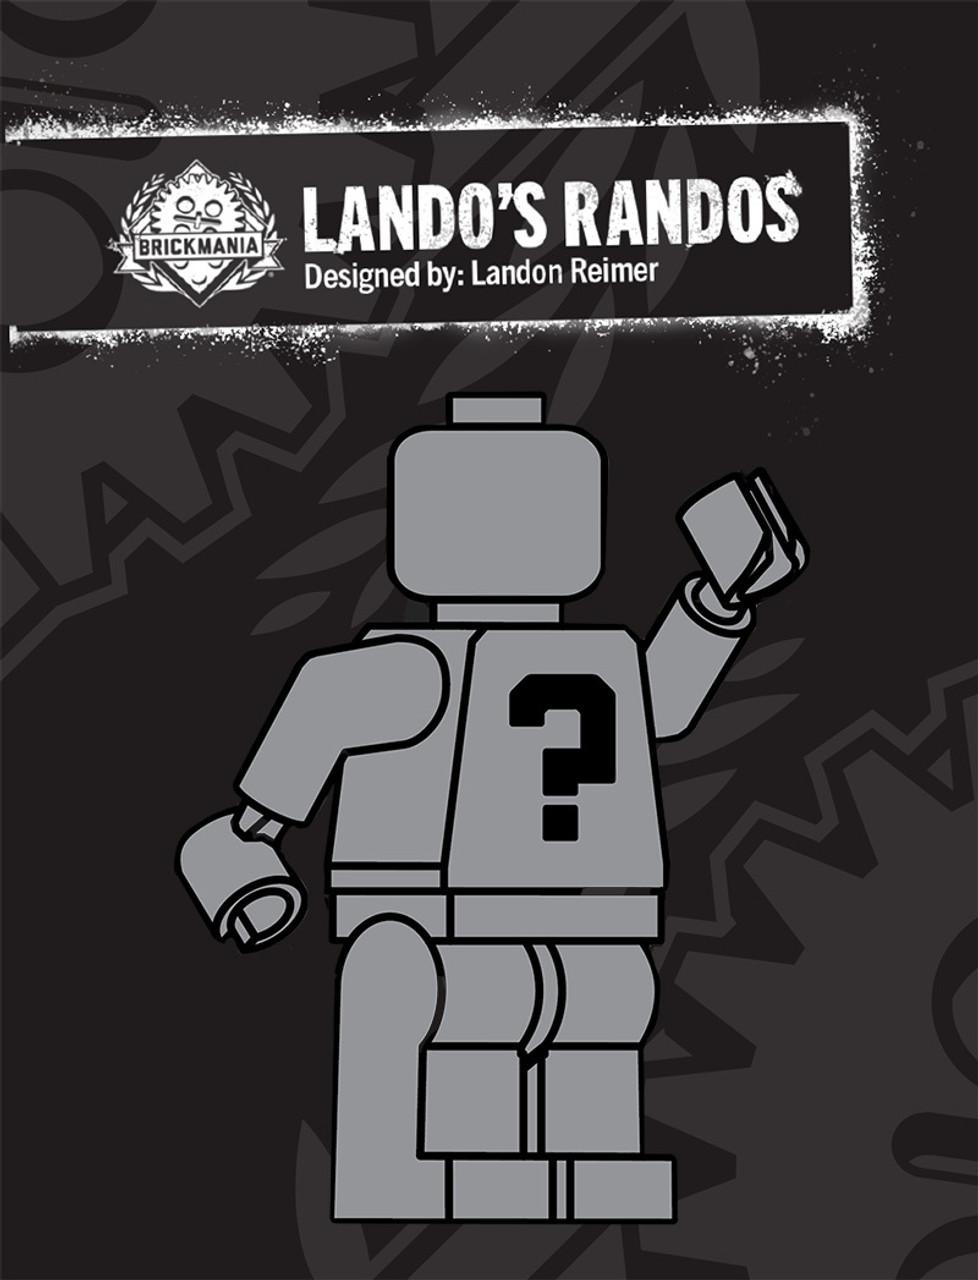 Lando's Randos